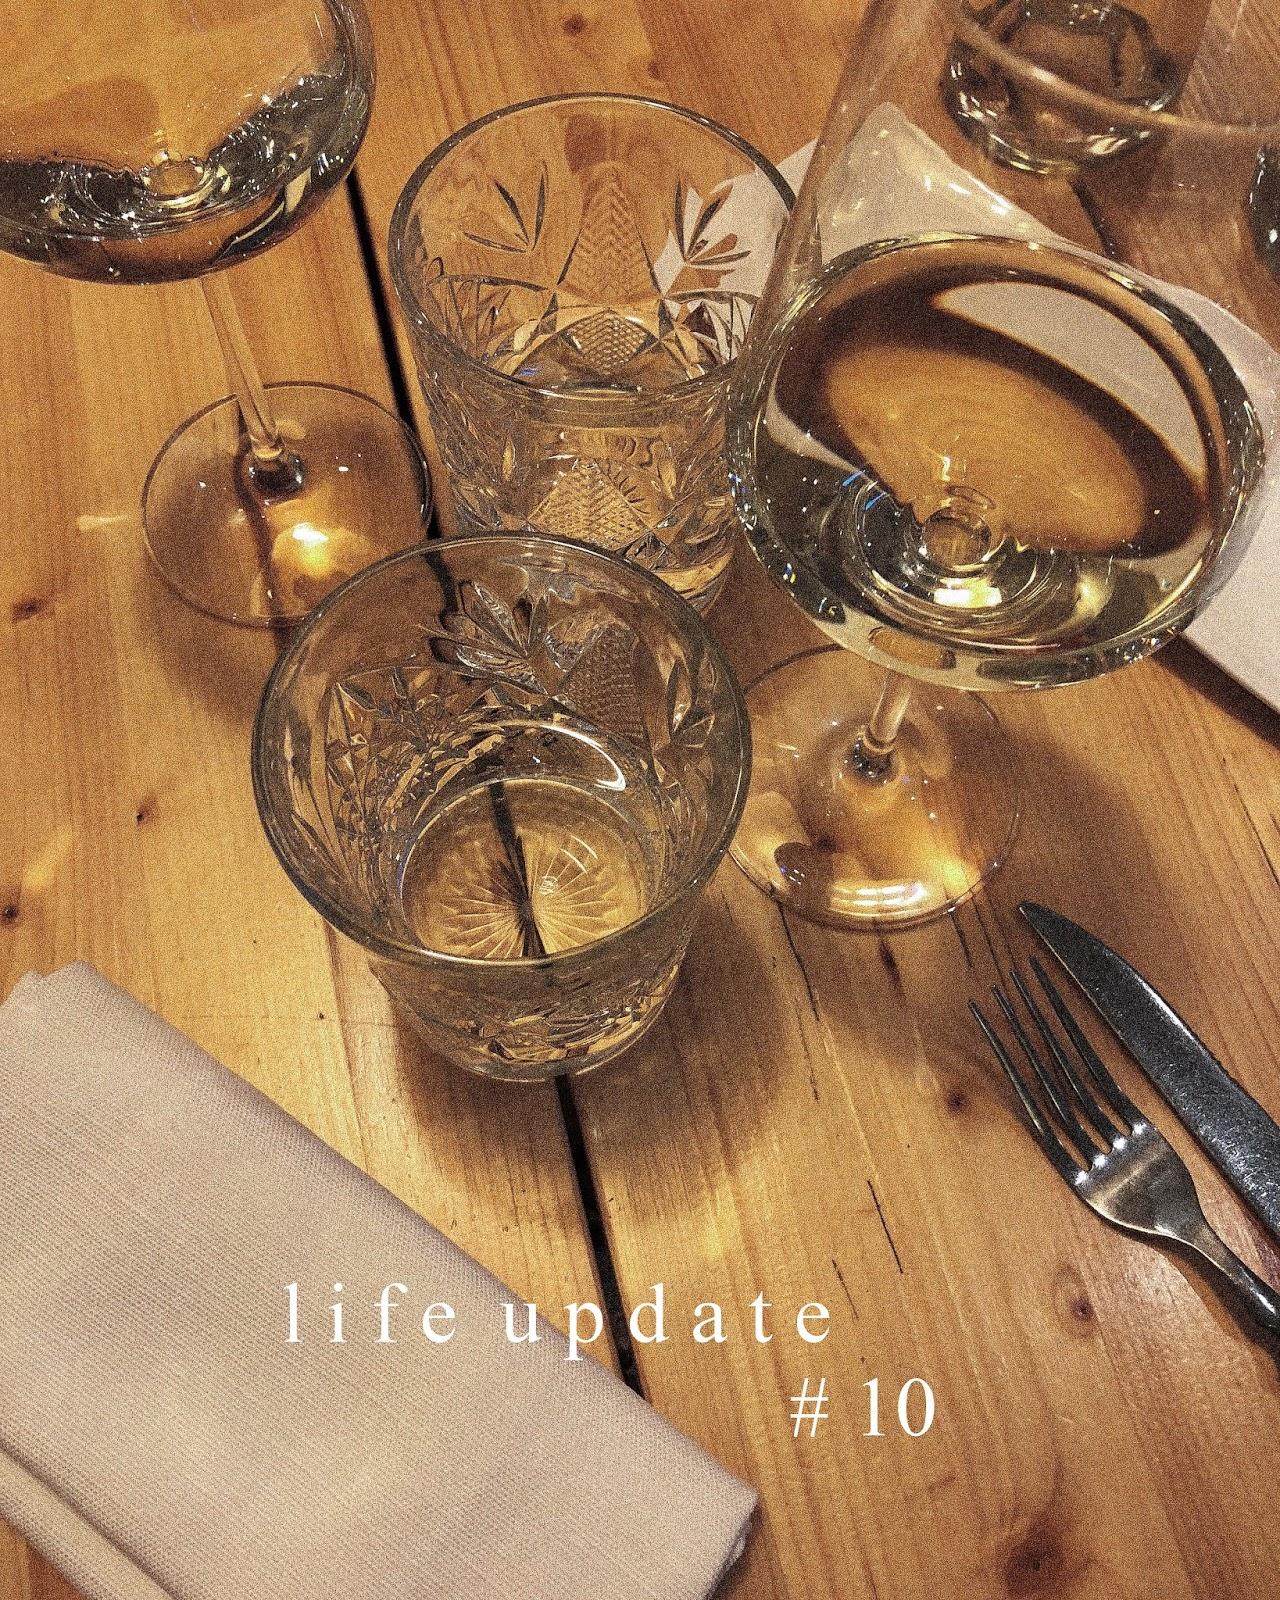 LIFE UPDATE #10